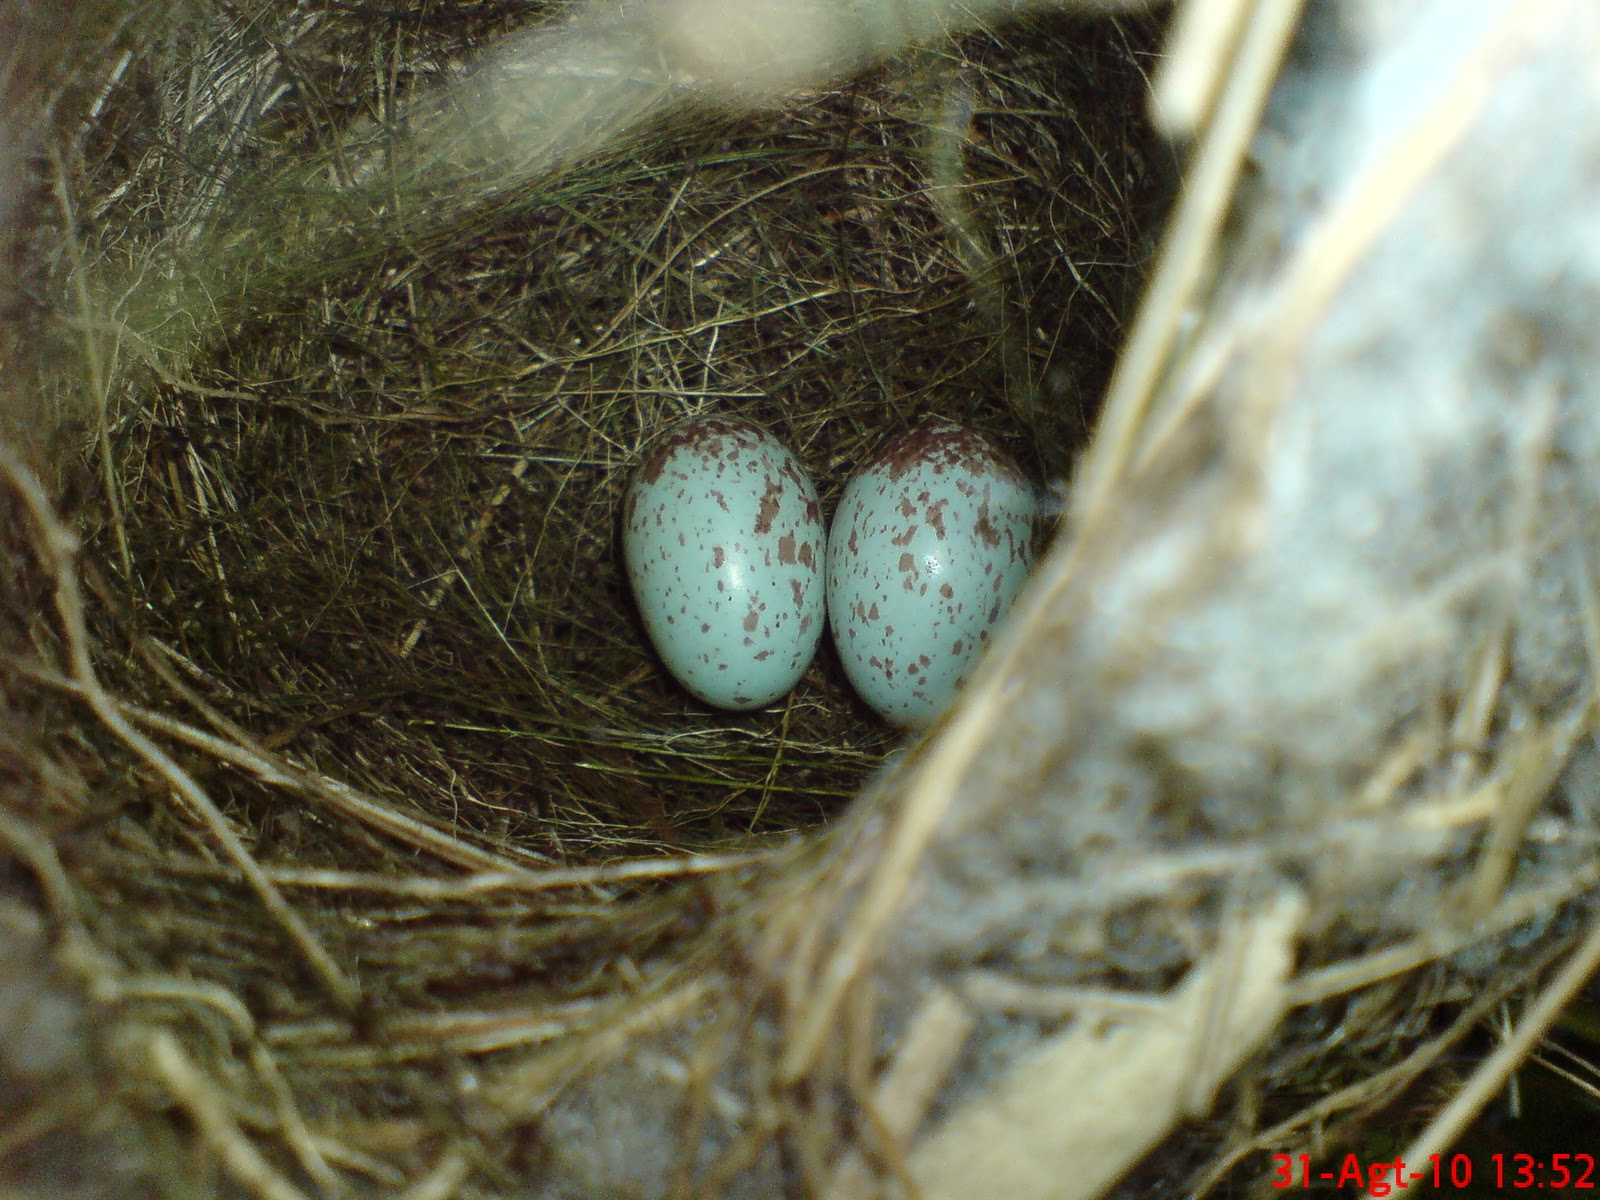 Telur Burung Gambar Pelangi Arsip